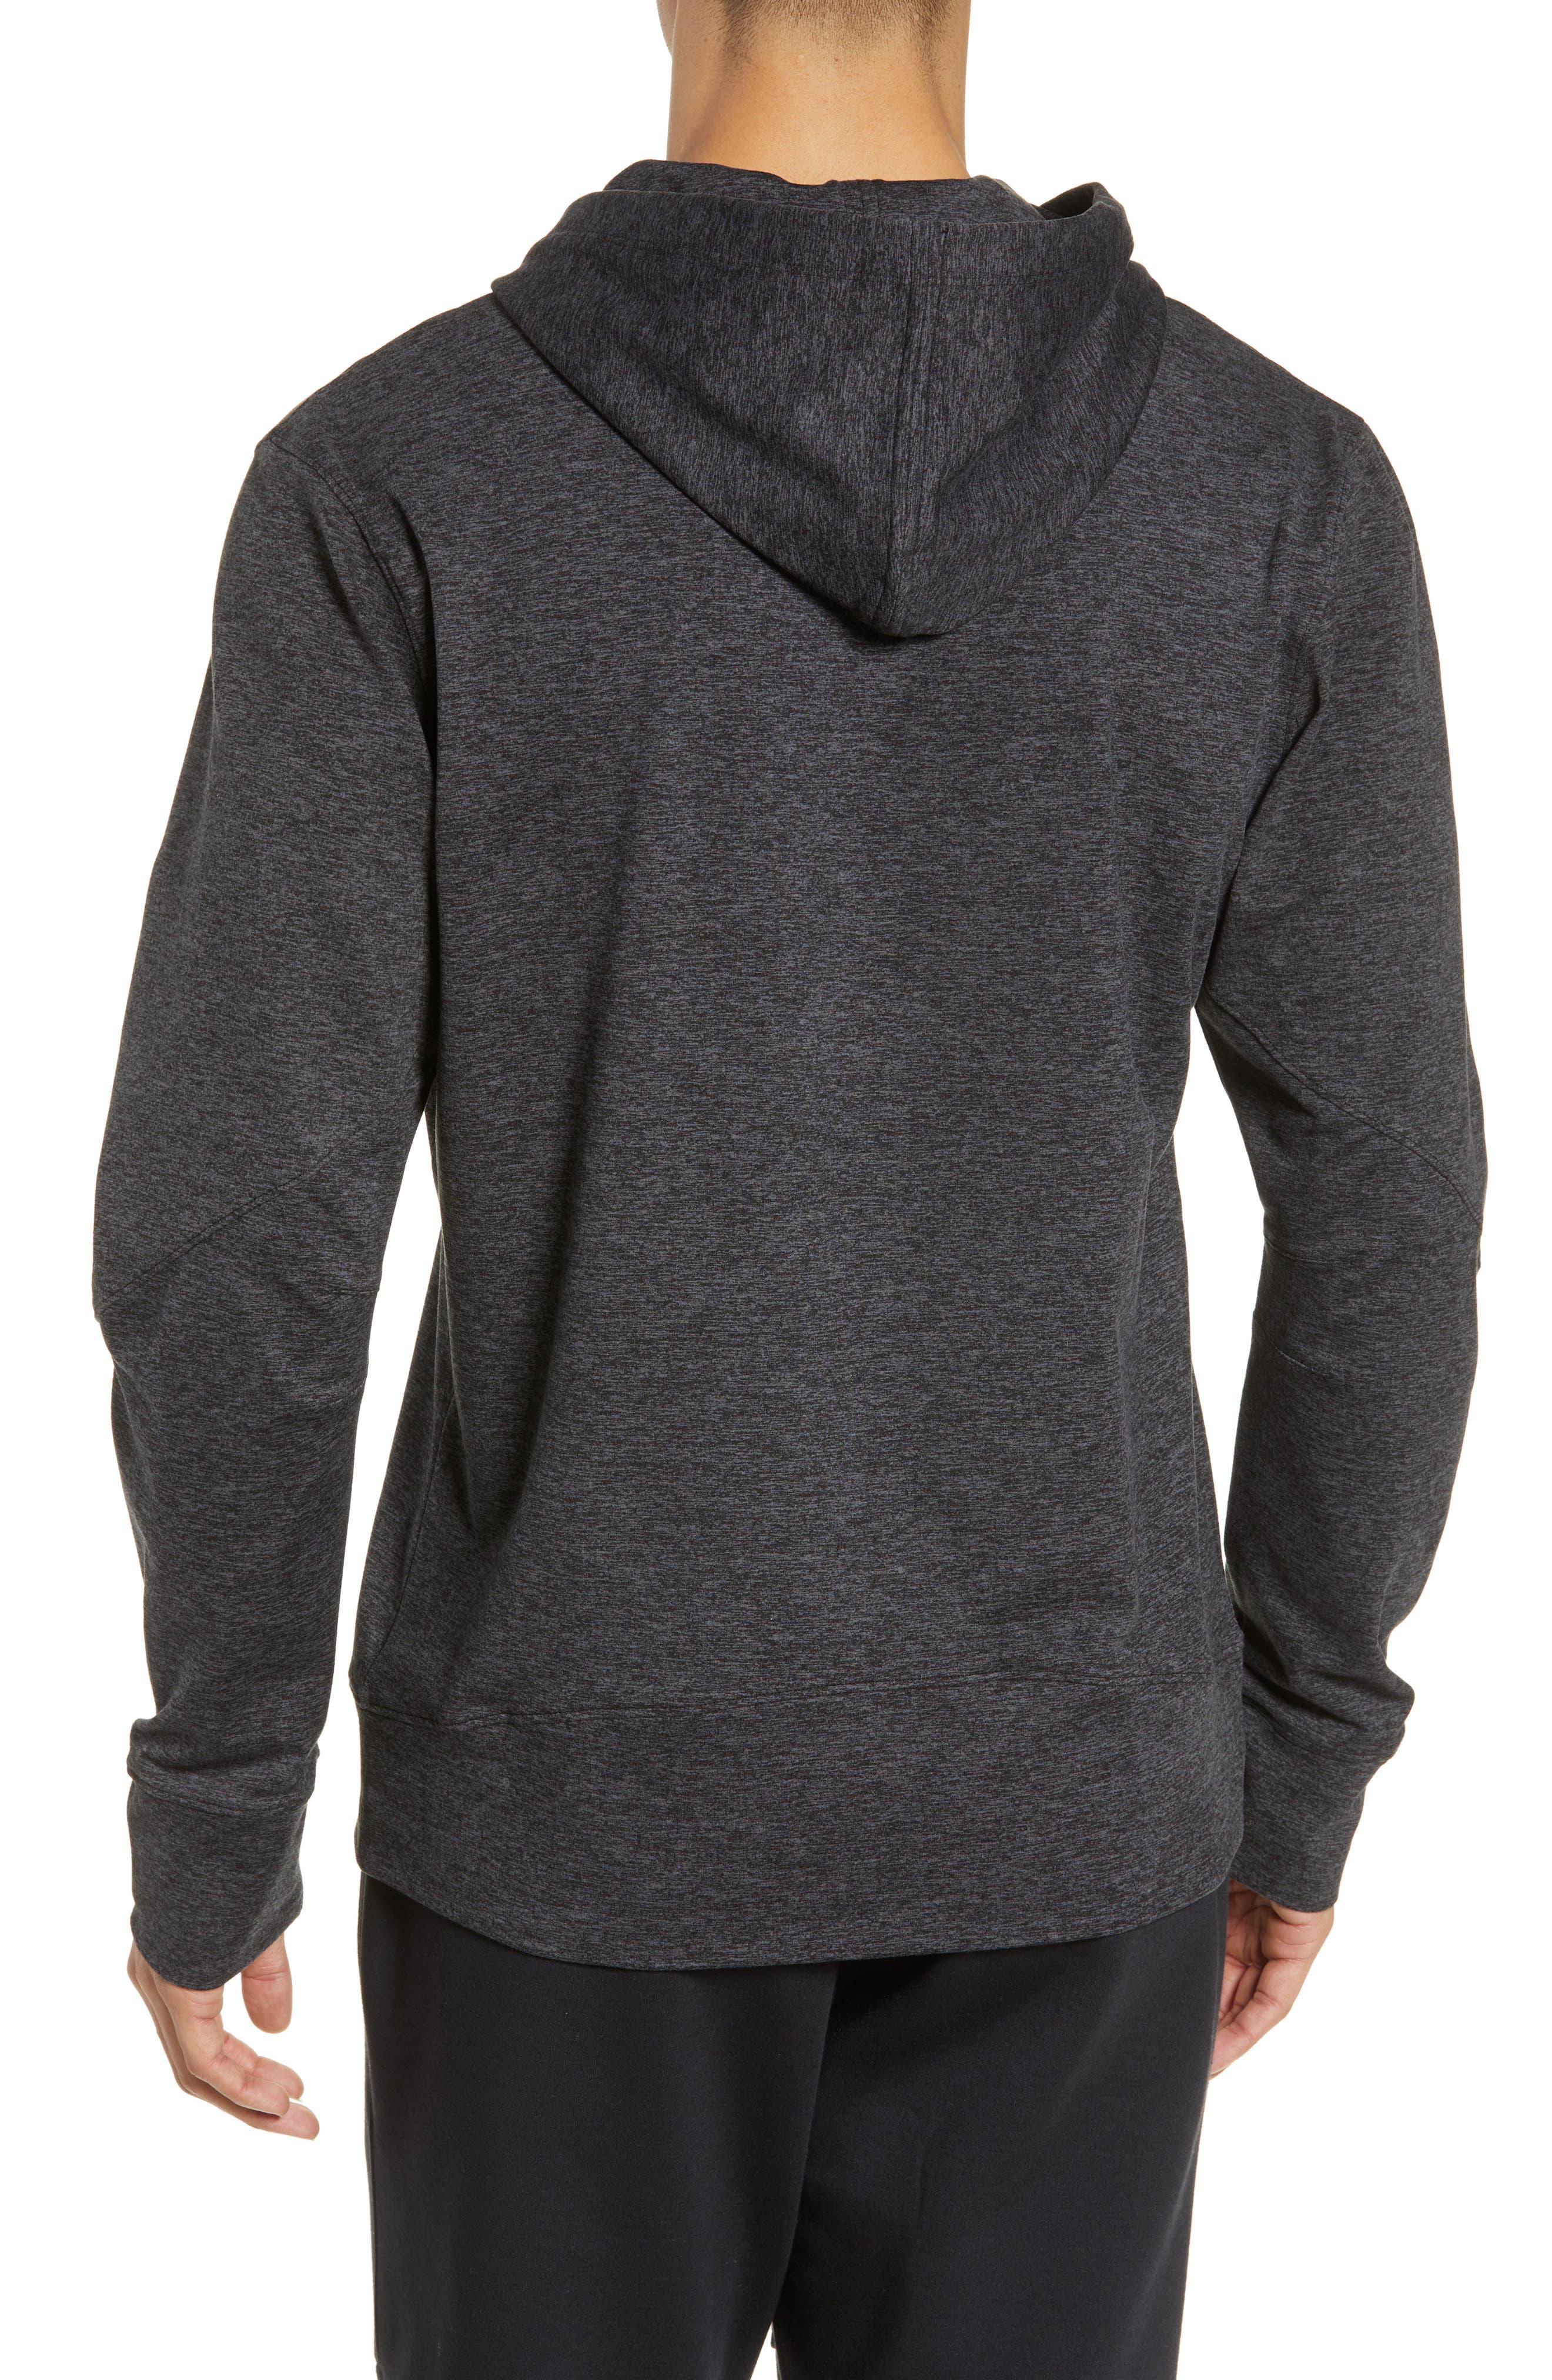 SODO, Elevate Hooded Sweatshirt, Alternate thumbnail 2, color, HEATHER CHARCOAL BLACK/ BLACK